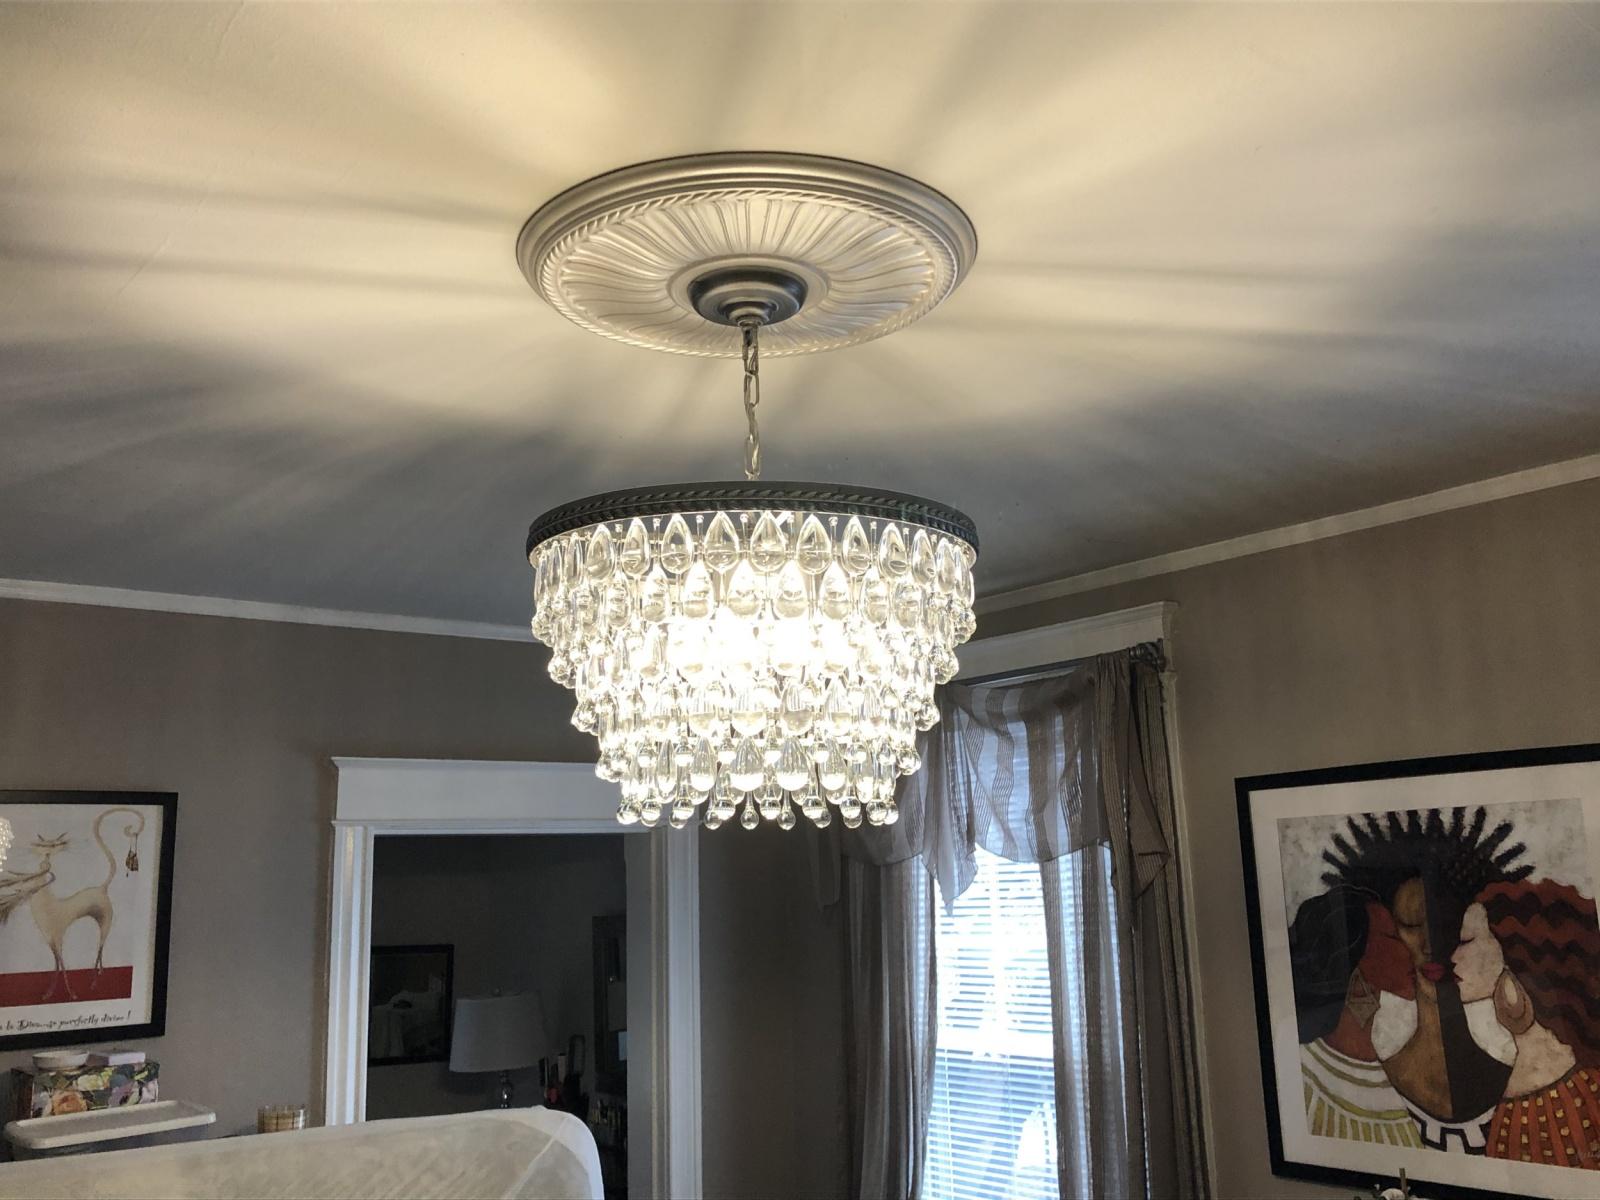 Crystal-chandelier-install